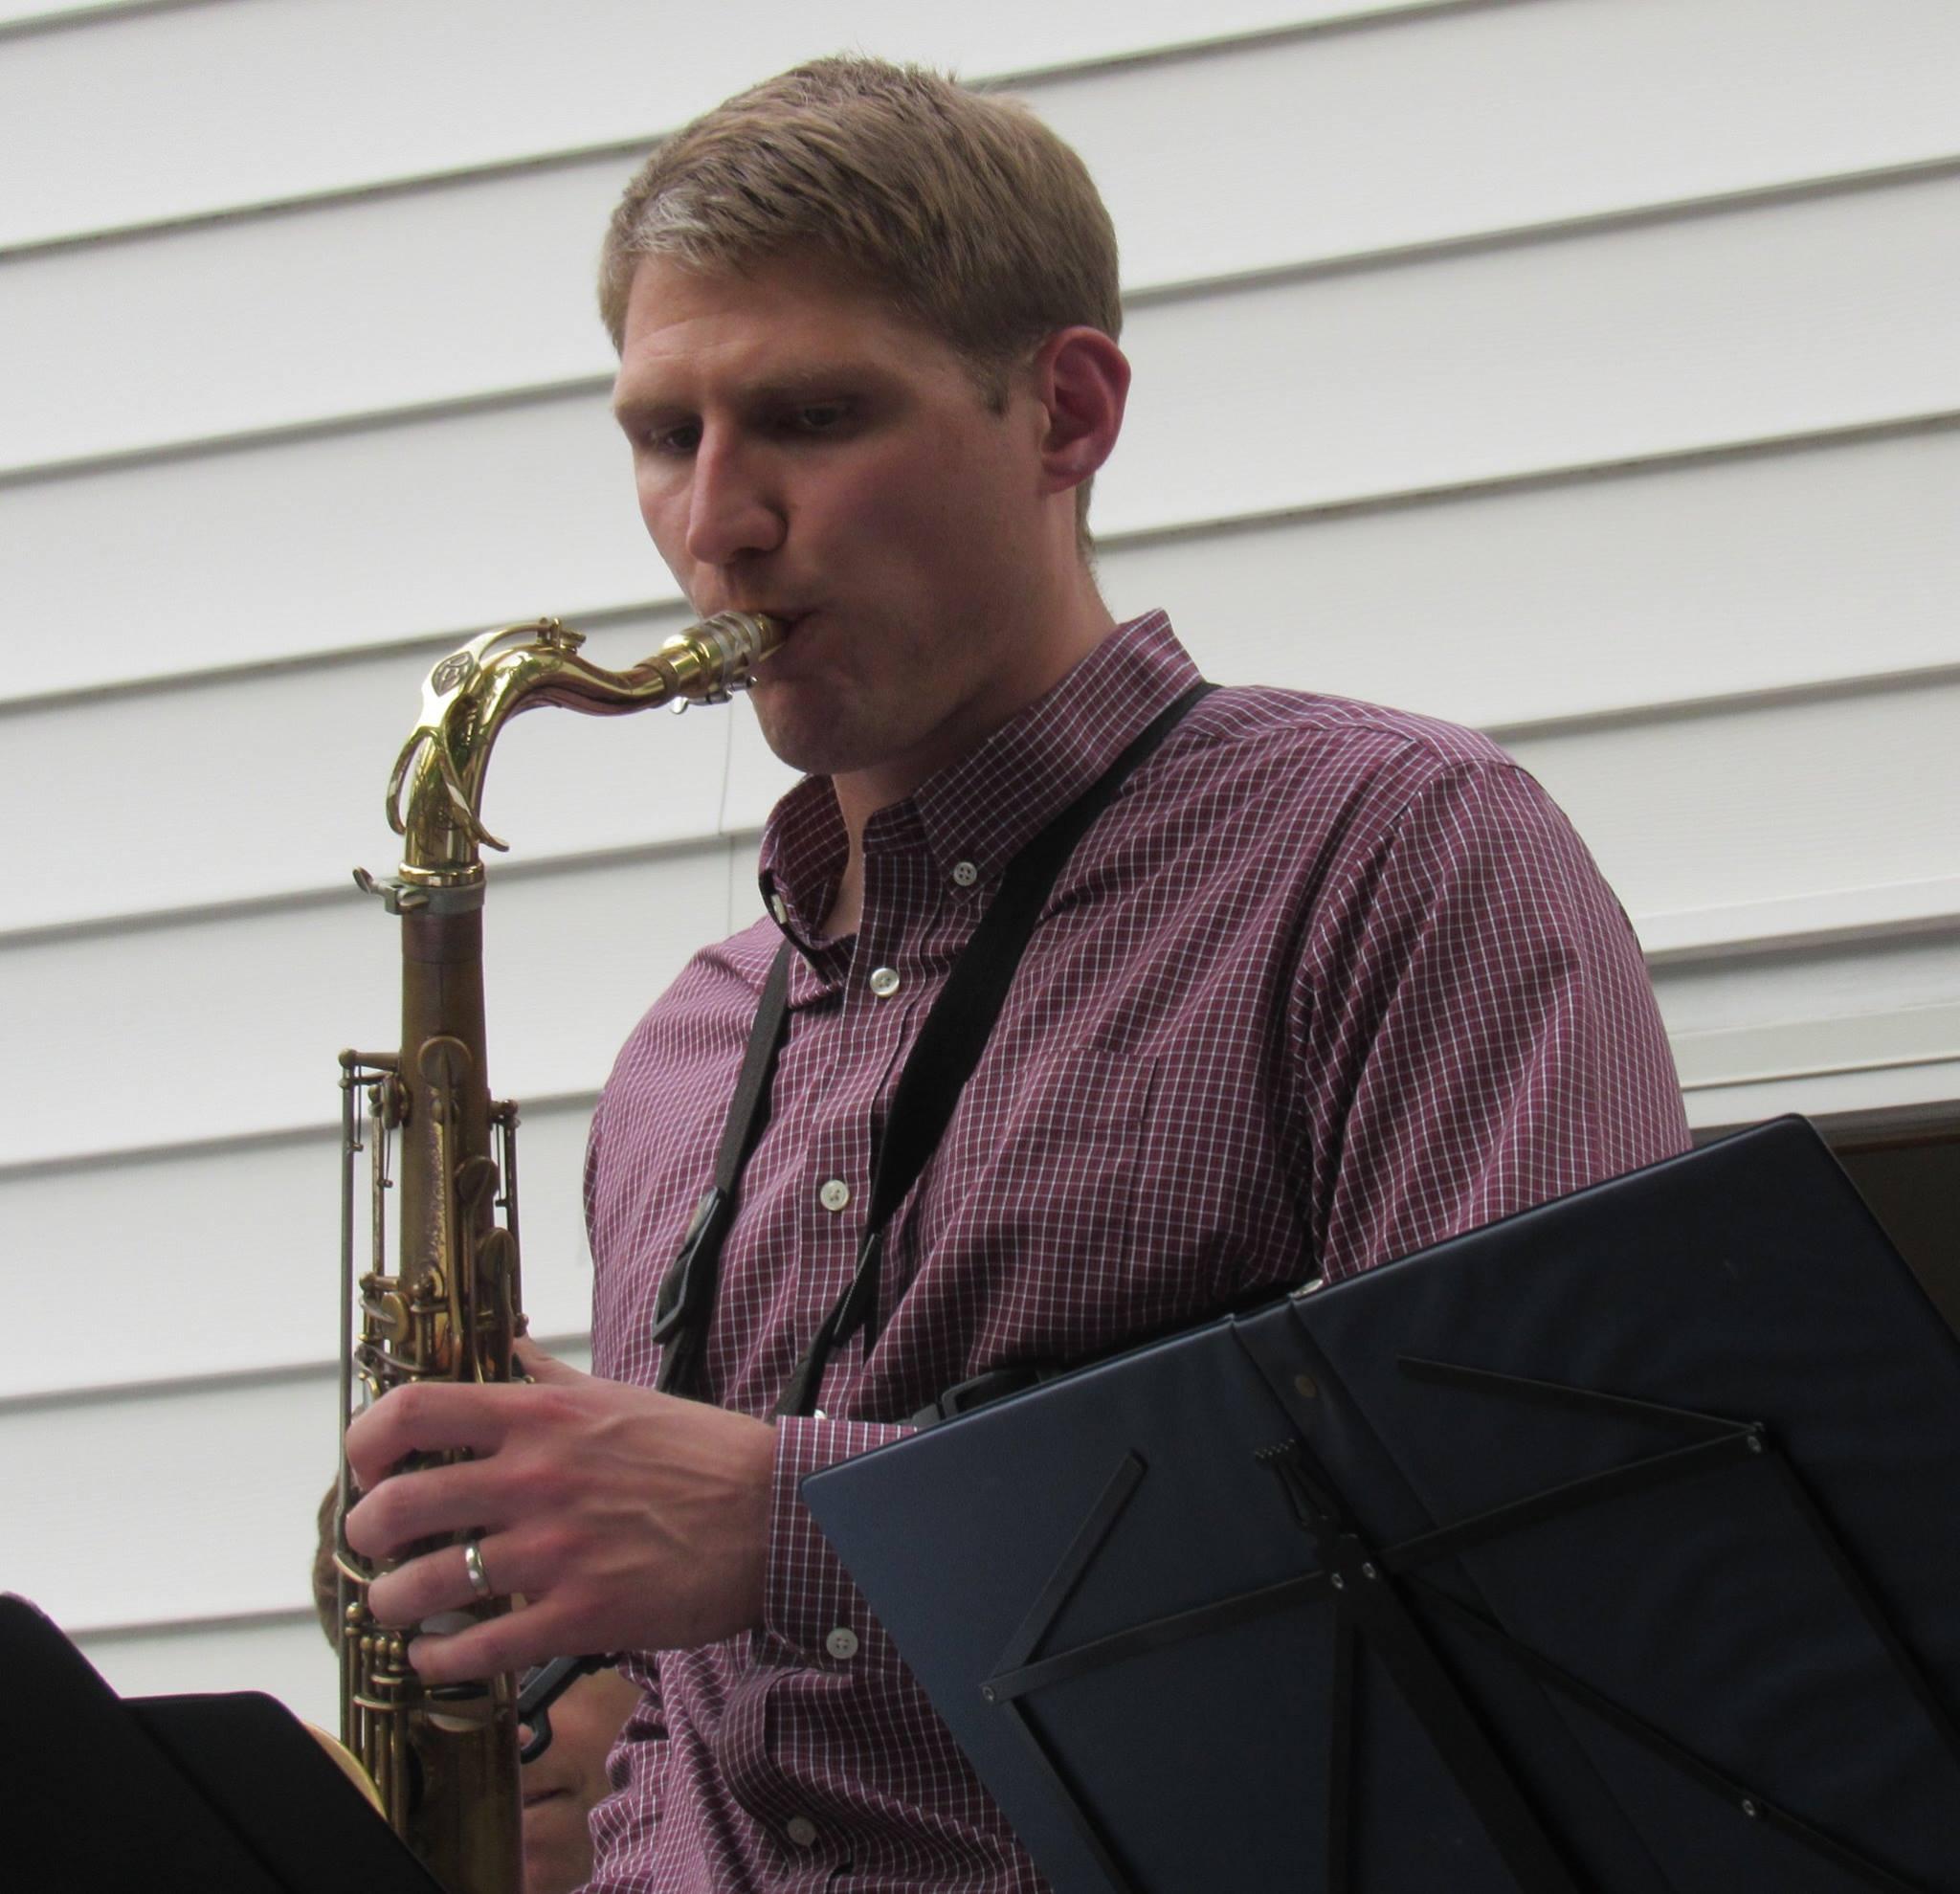 Matt Clauhs,tenor sax